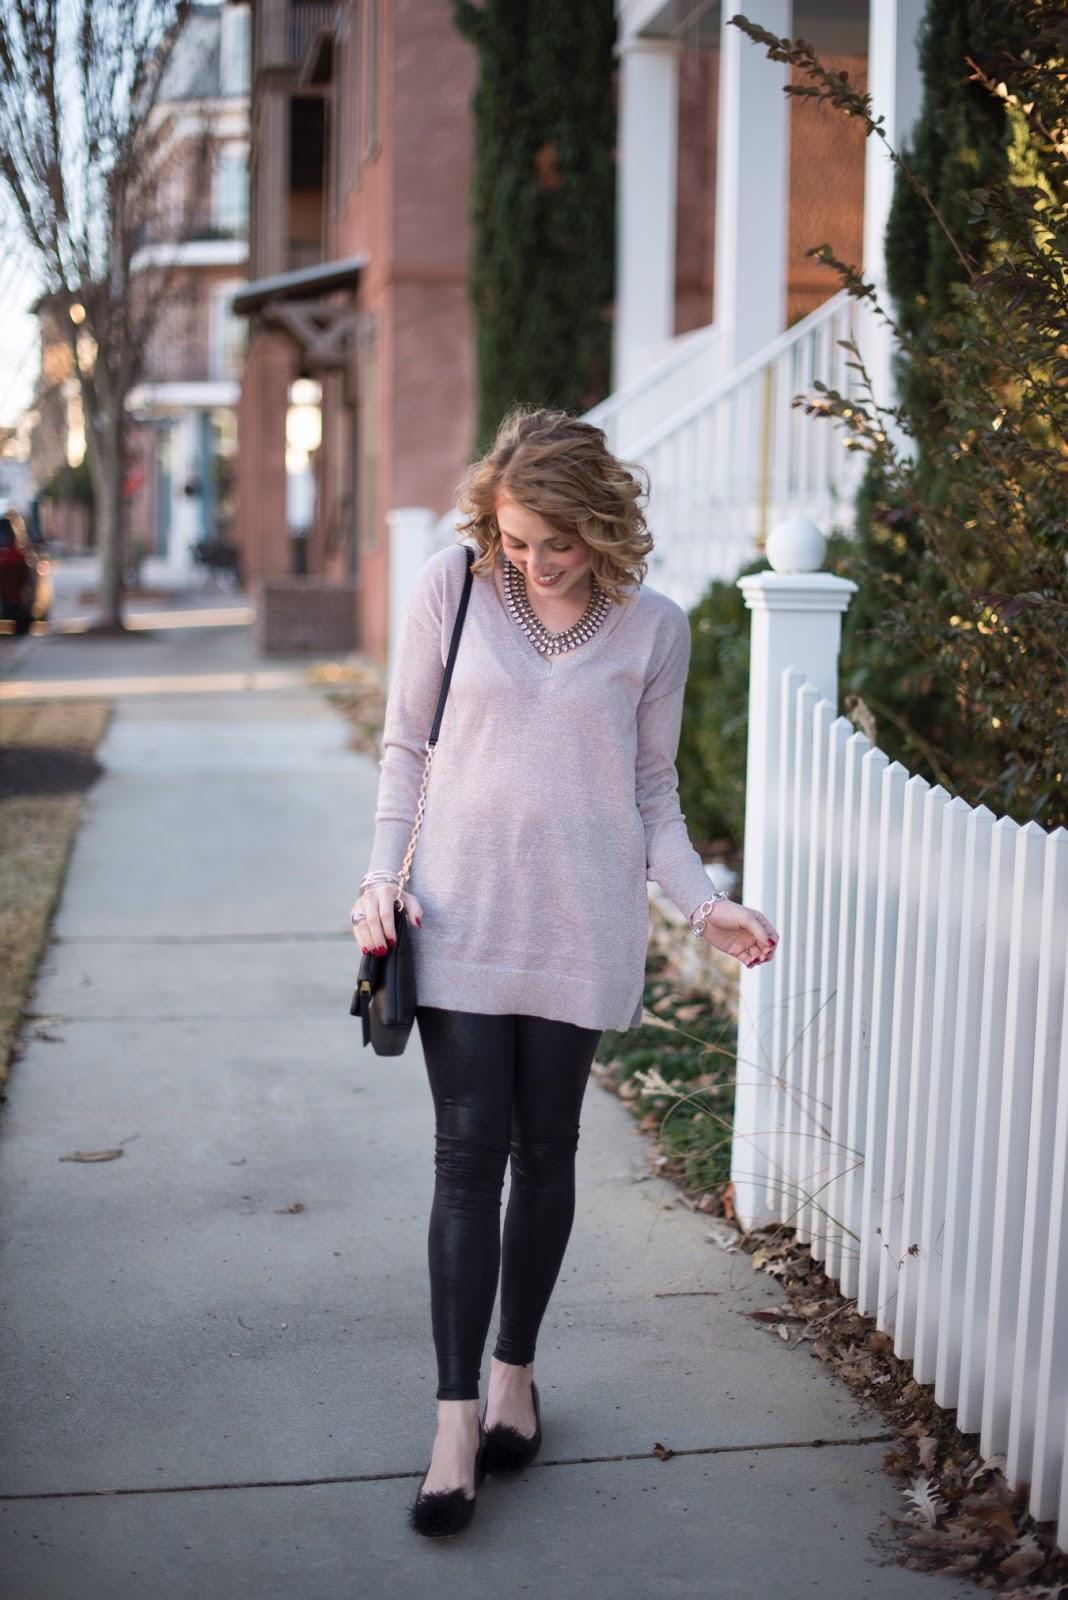 Faux Leather Leggings - Something Delightful Blog